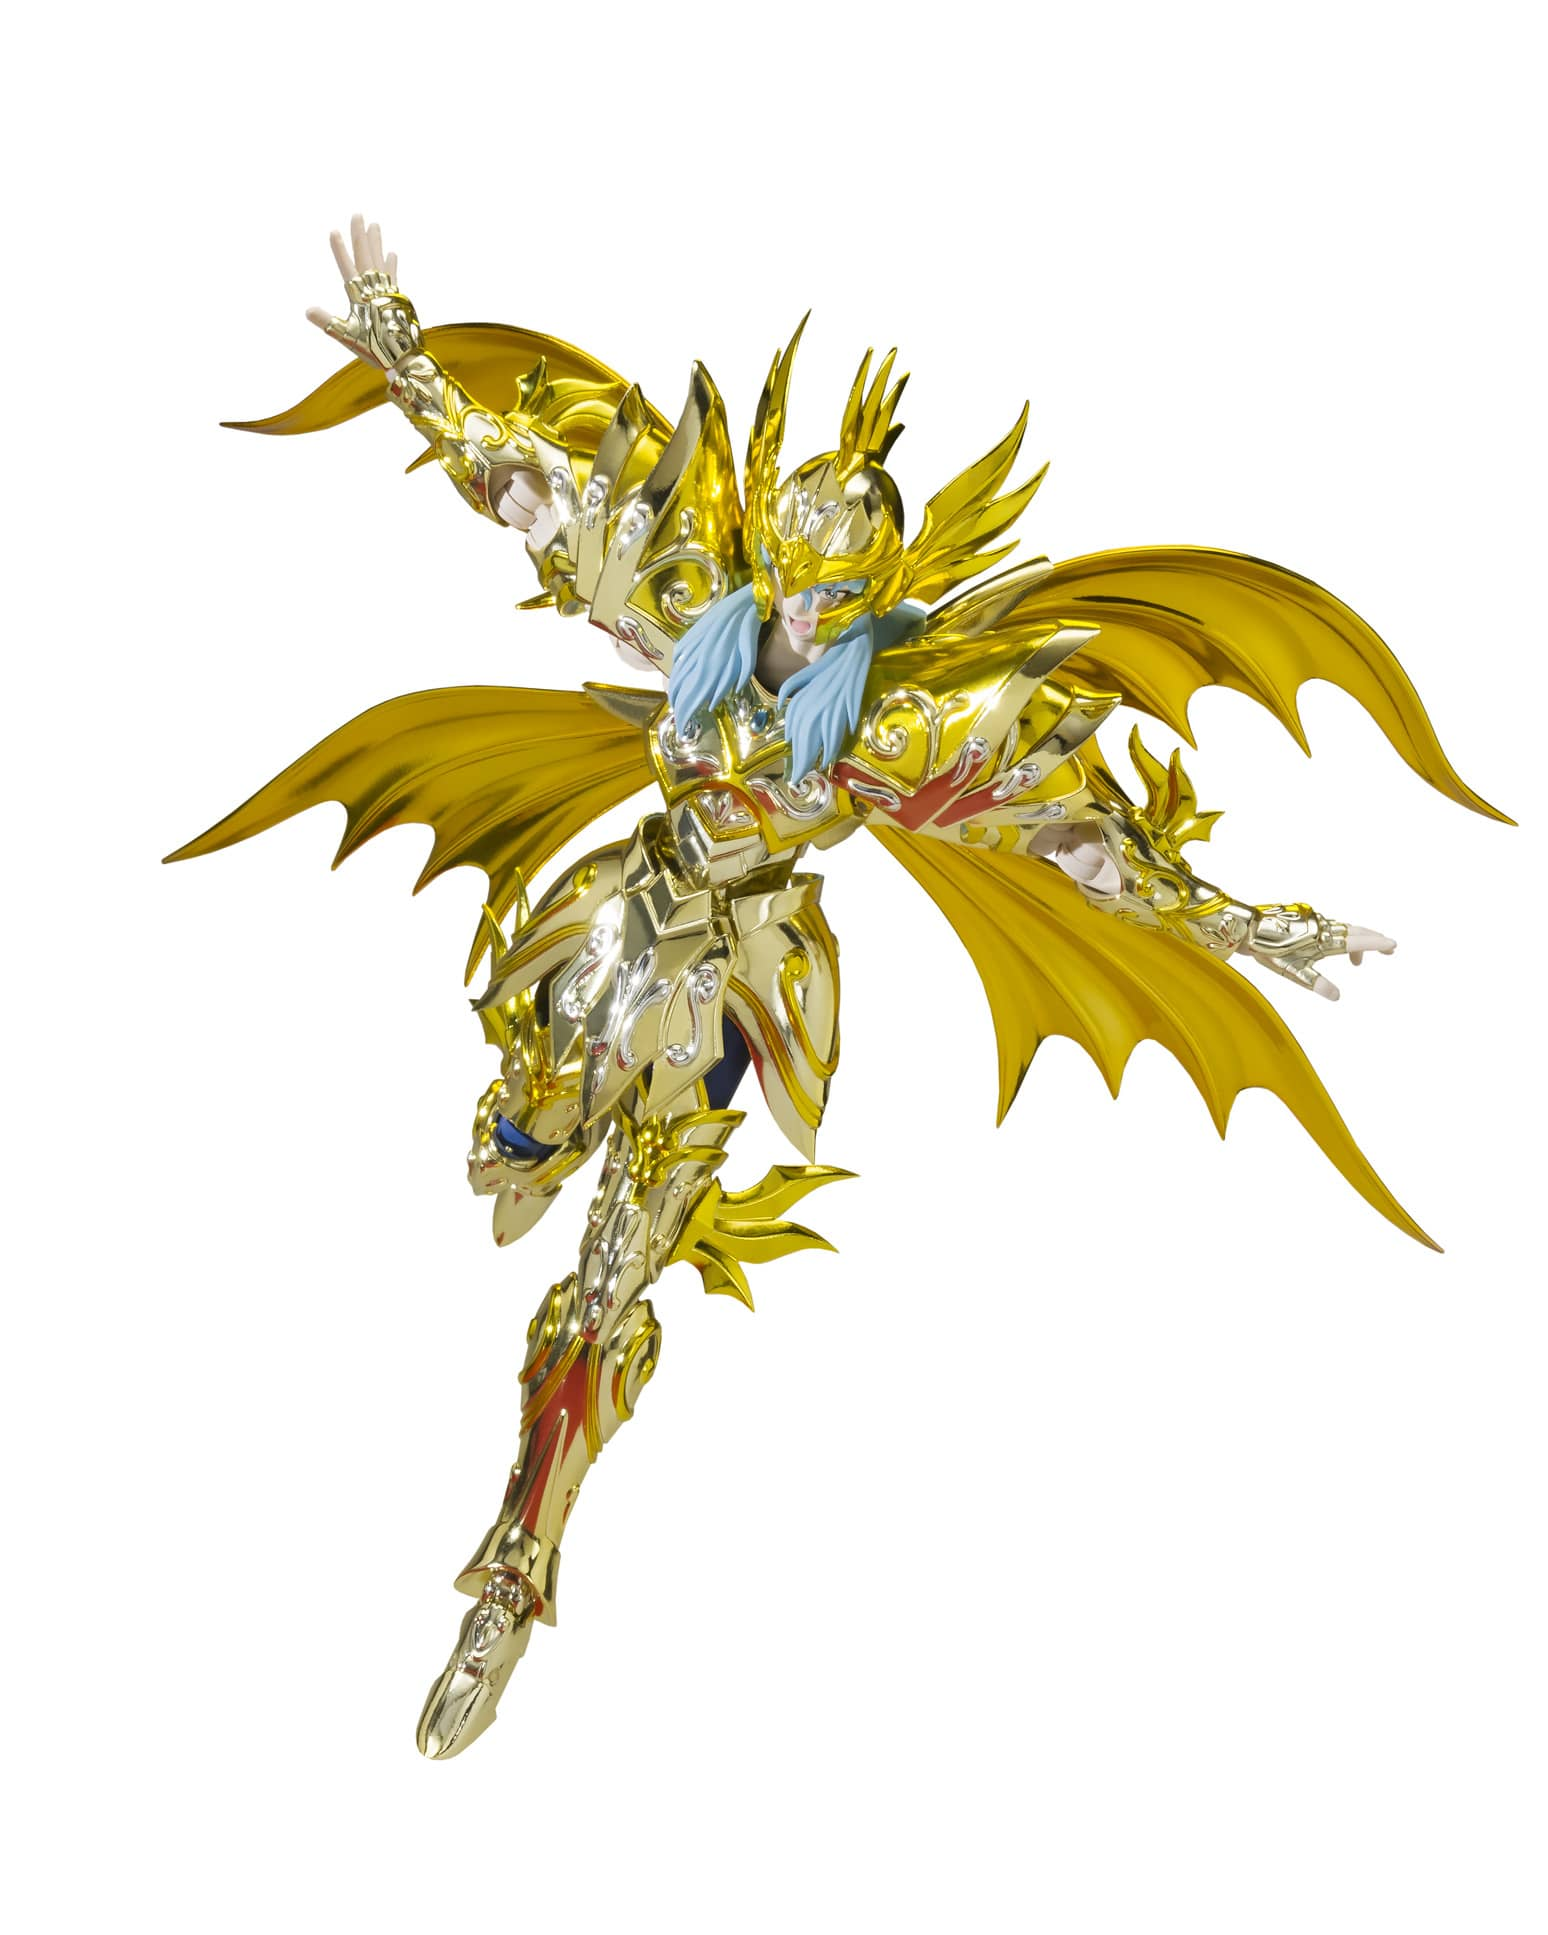 AFRODITA PISCIS NEW CLOTH FIGURA 18 CM SAINT SEIYA SAINT CLOTH MYTH EX SOUL OF GOLD